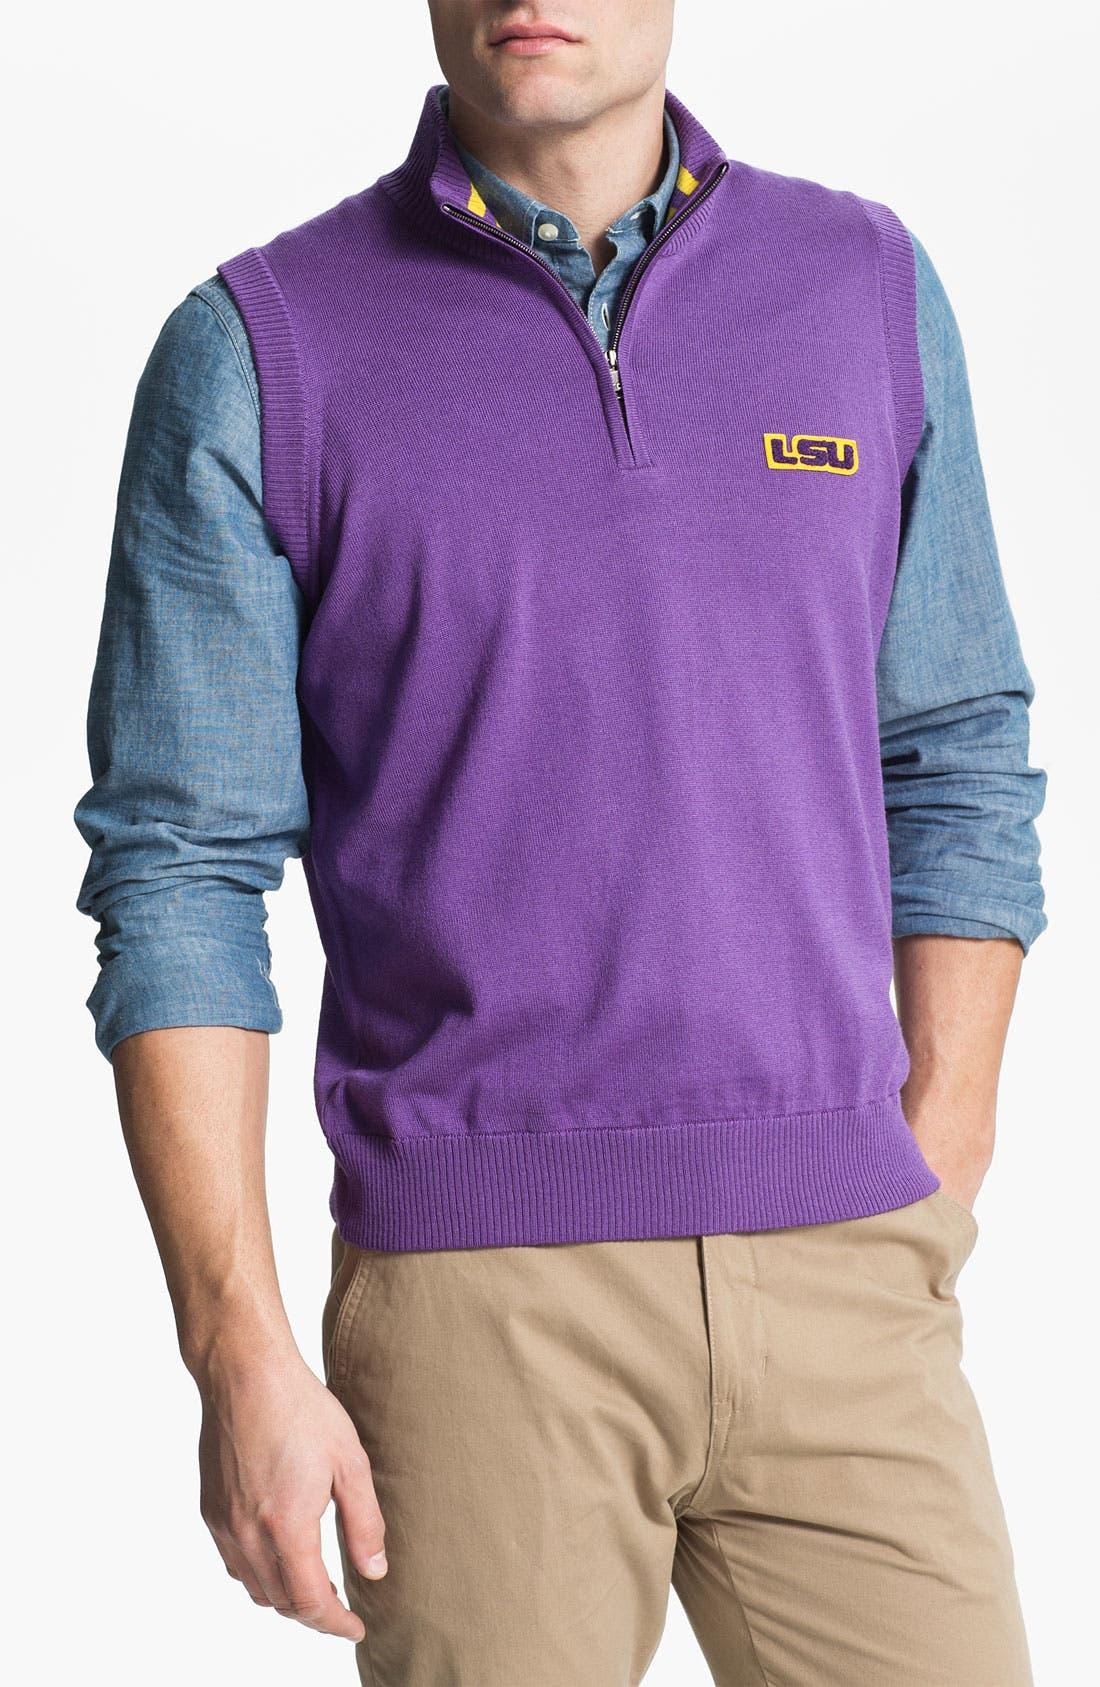 Alternate Image 1 Selected - Thomas Dean 'Louisiana State University' Quarter Zip Sweater Vest